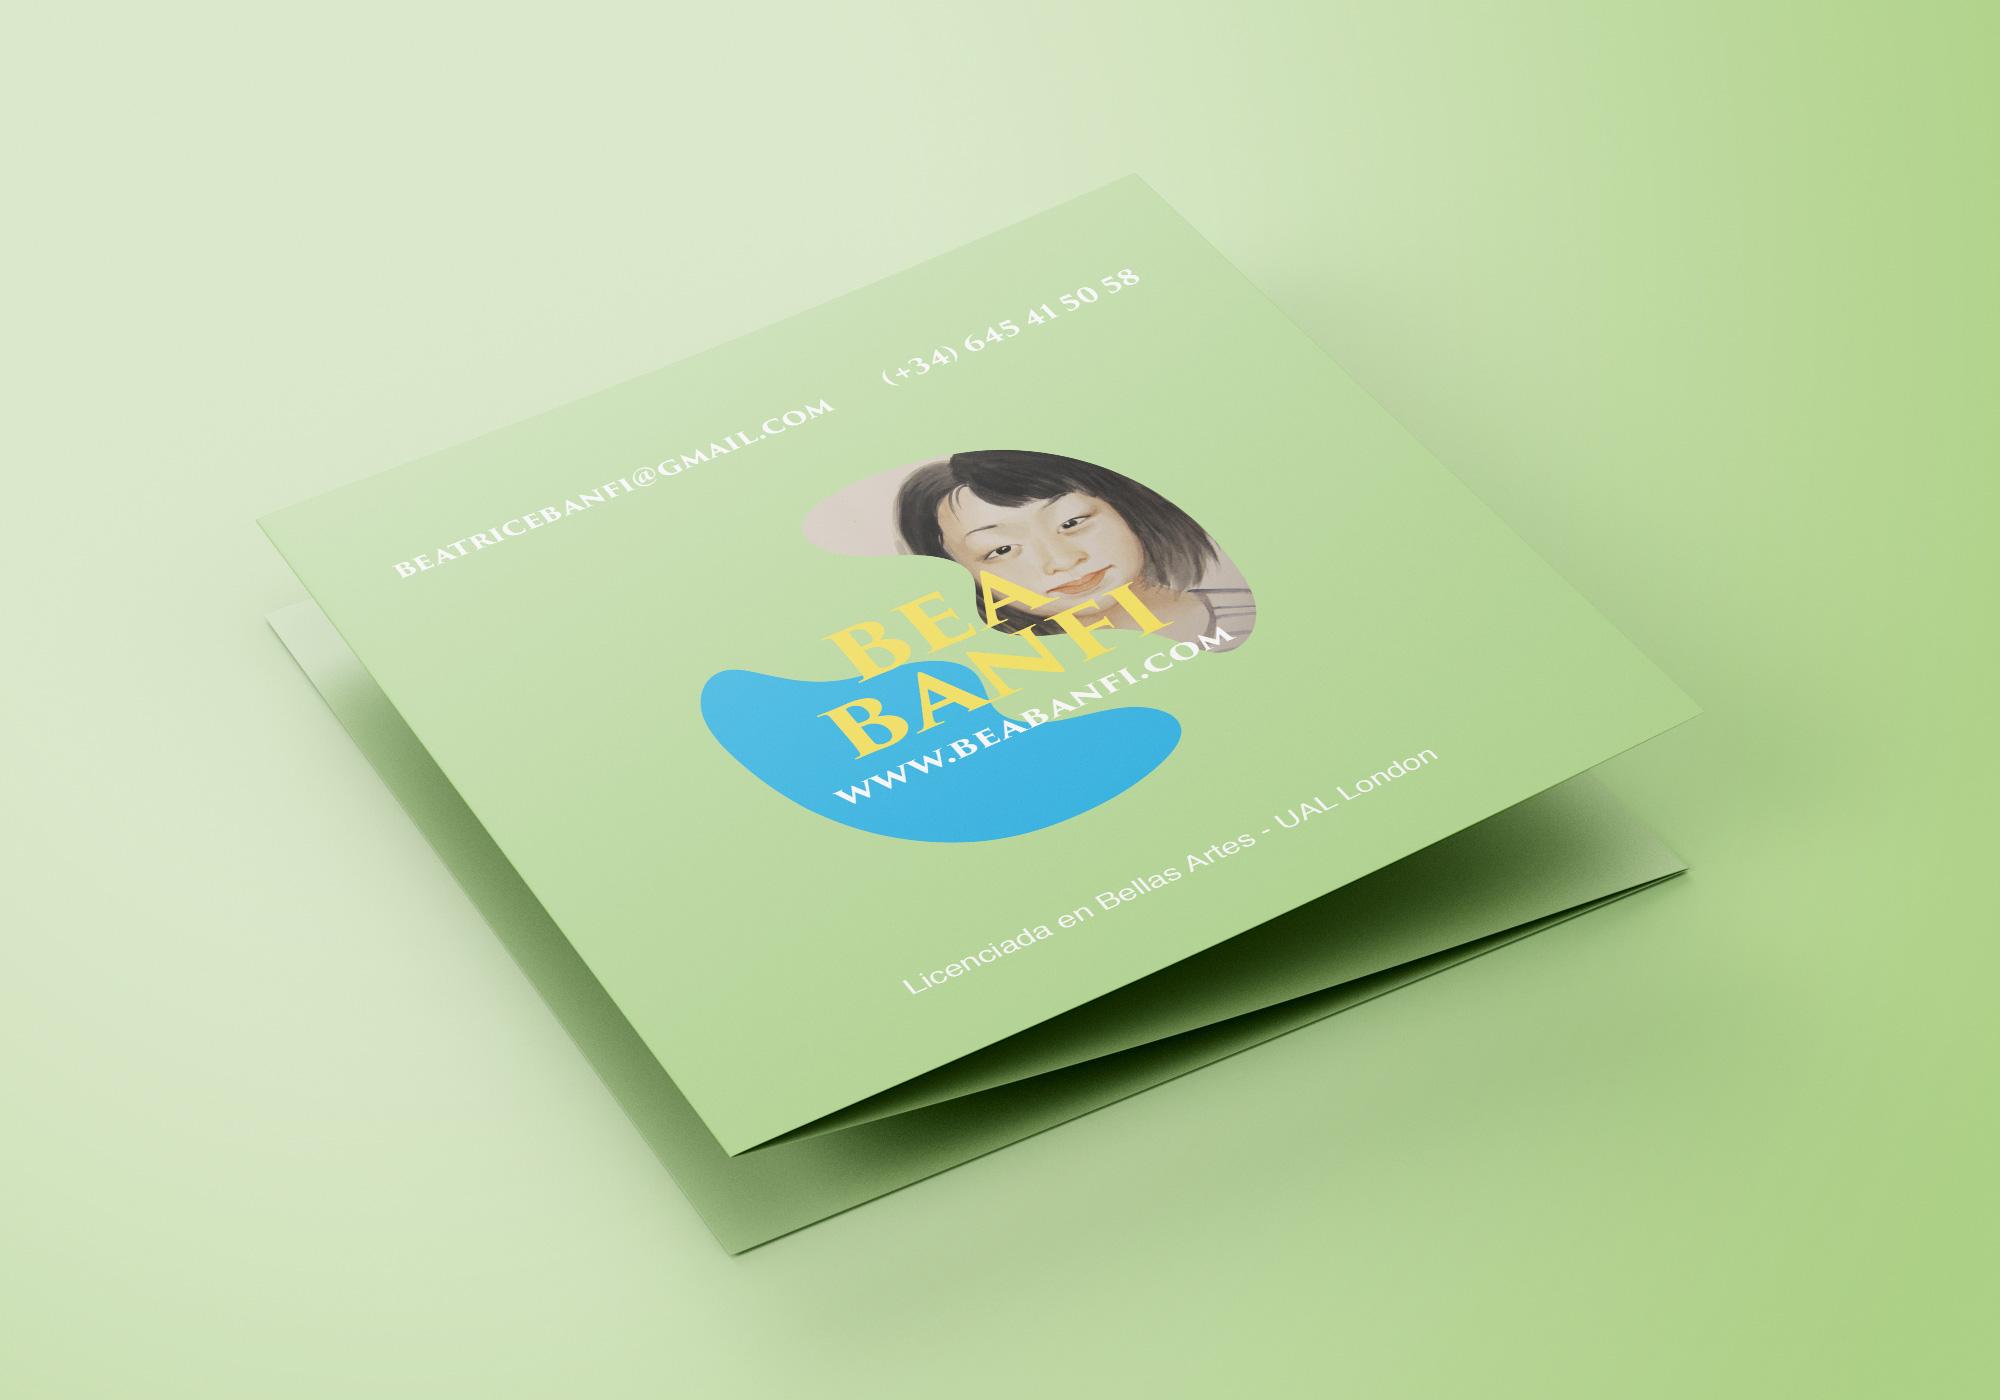 bea banfi disseny grafic ilustracio angels pinyol graphic design vilafranca penedes - BEA BANFI - Catàleg i imatge gràfica